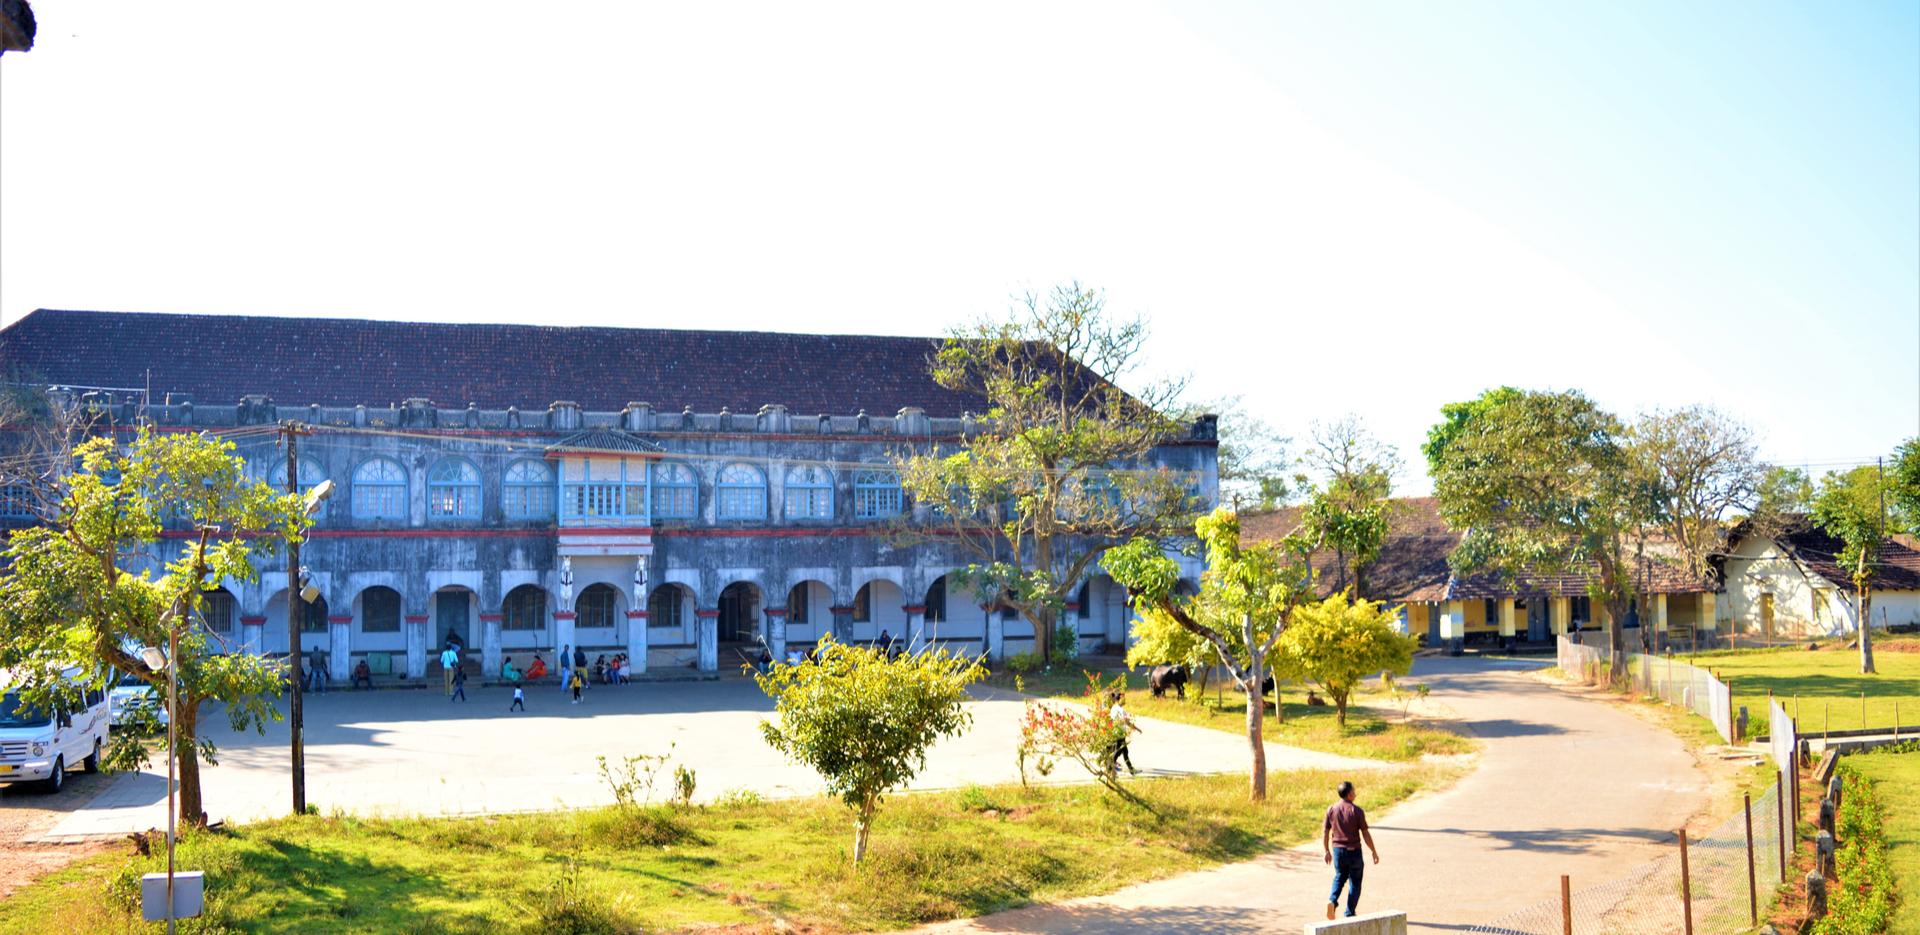 Madikeri Fort entrance in Coorg